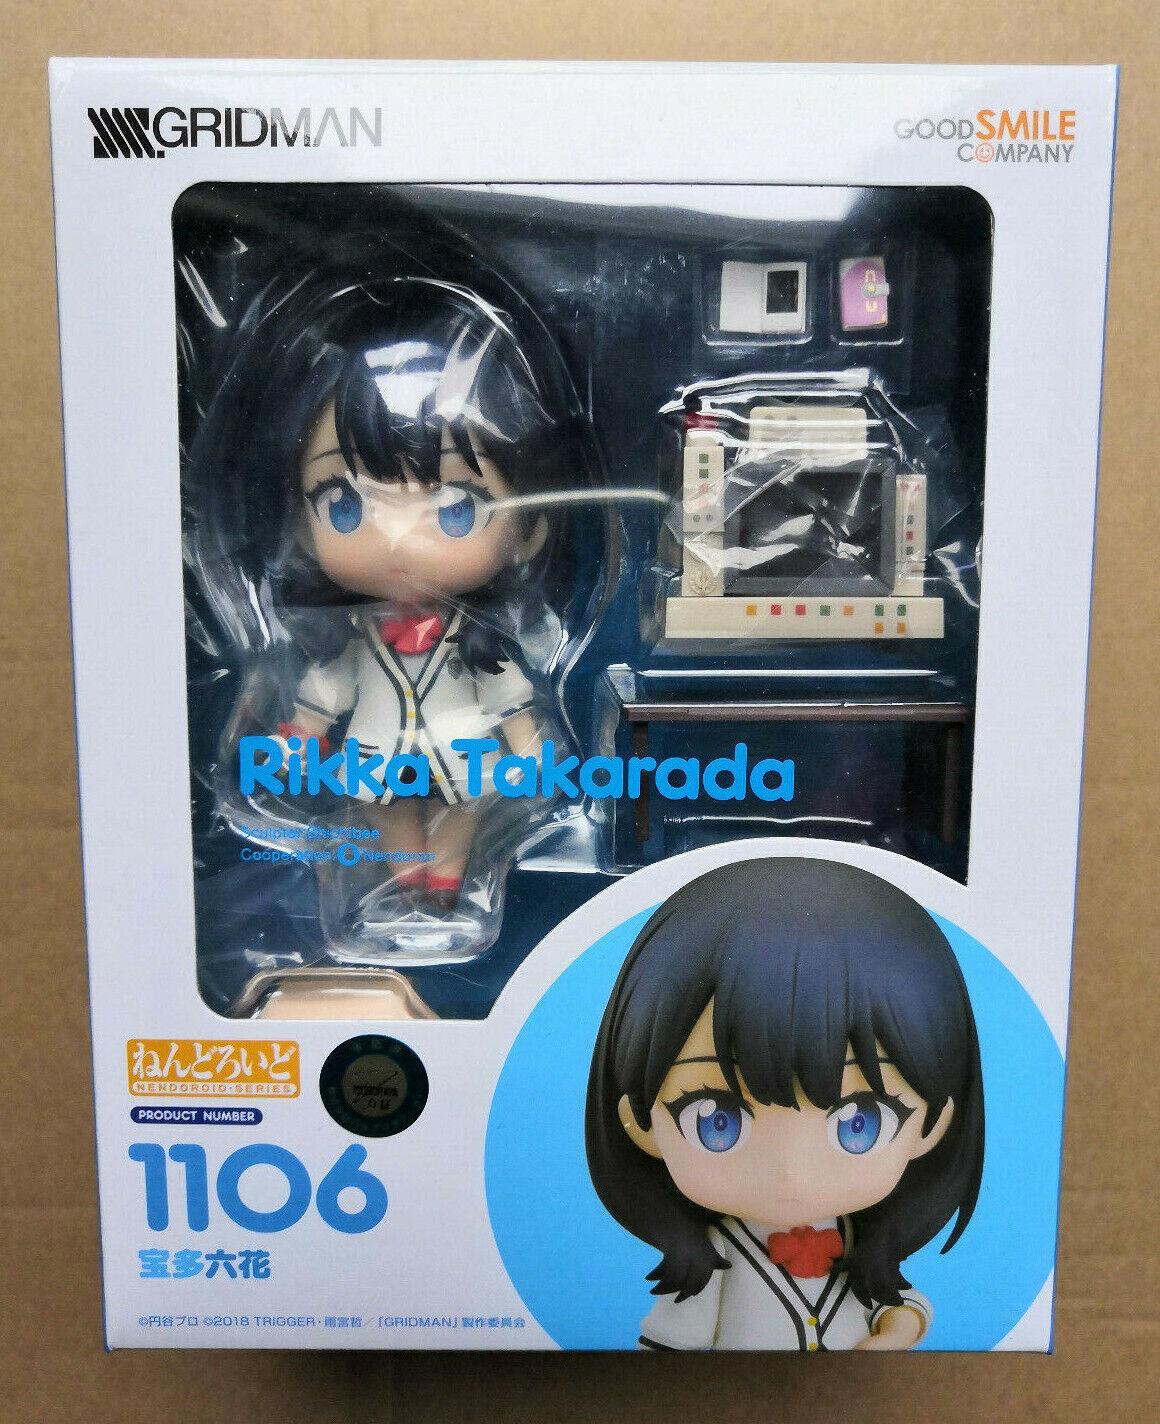 Sss griduomo Nendoroid RIKKA Takarada azione cifra GoodSmile azienda Nuovo di Zecca